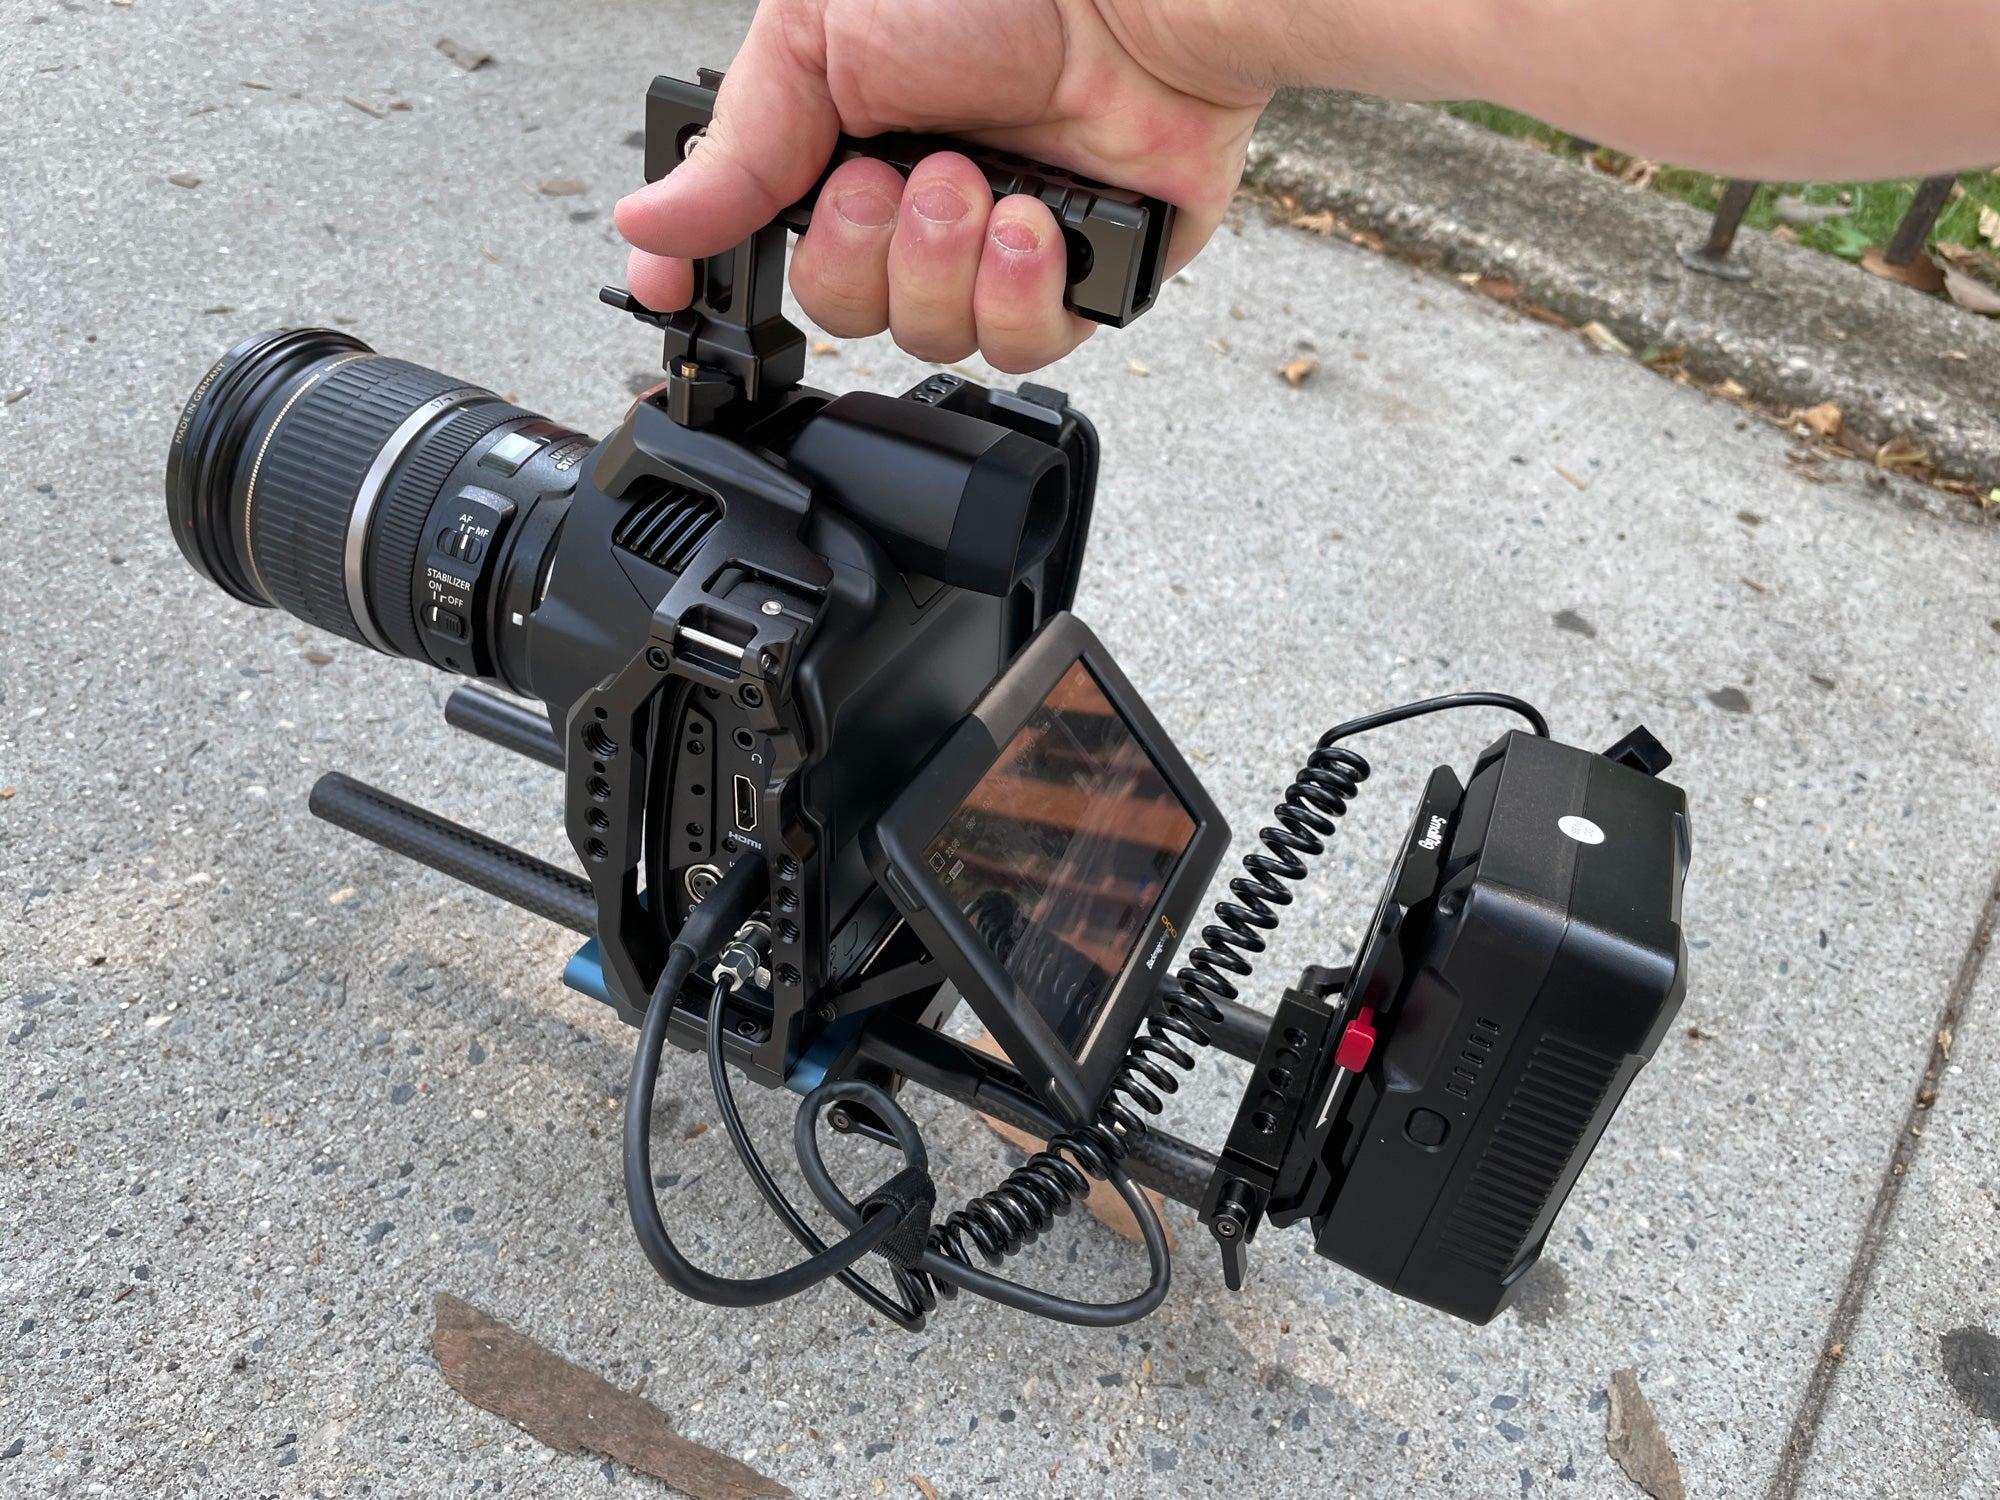 BMPCC 6k Pro with lens